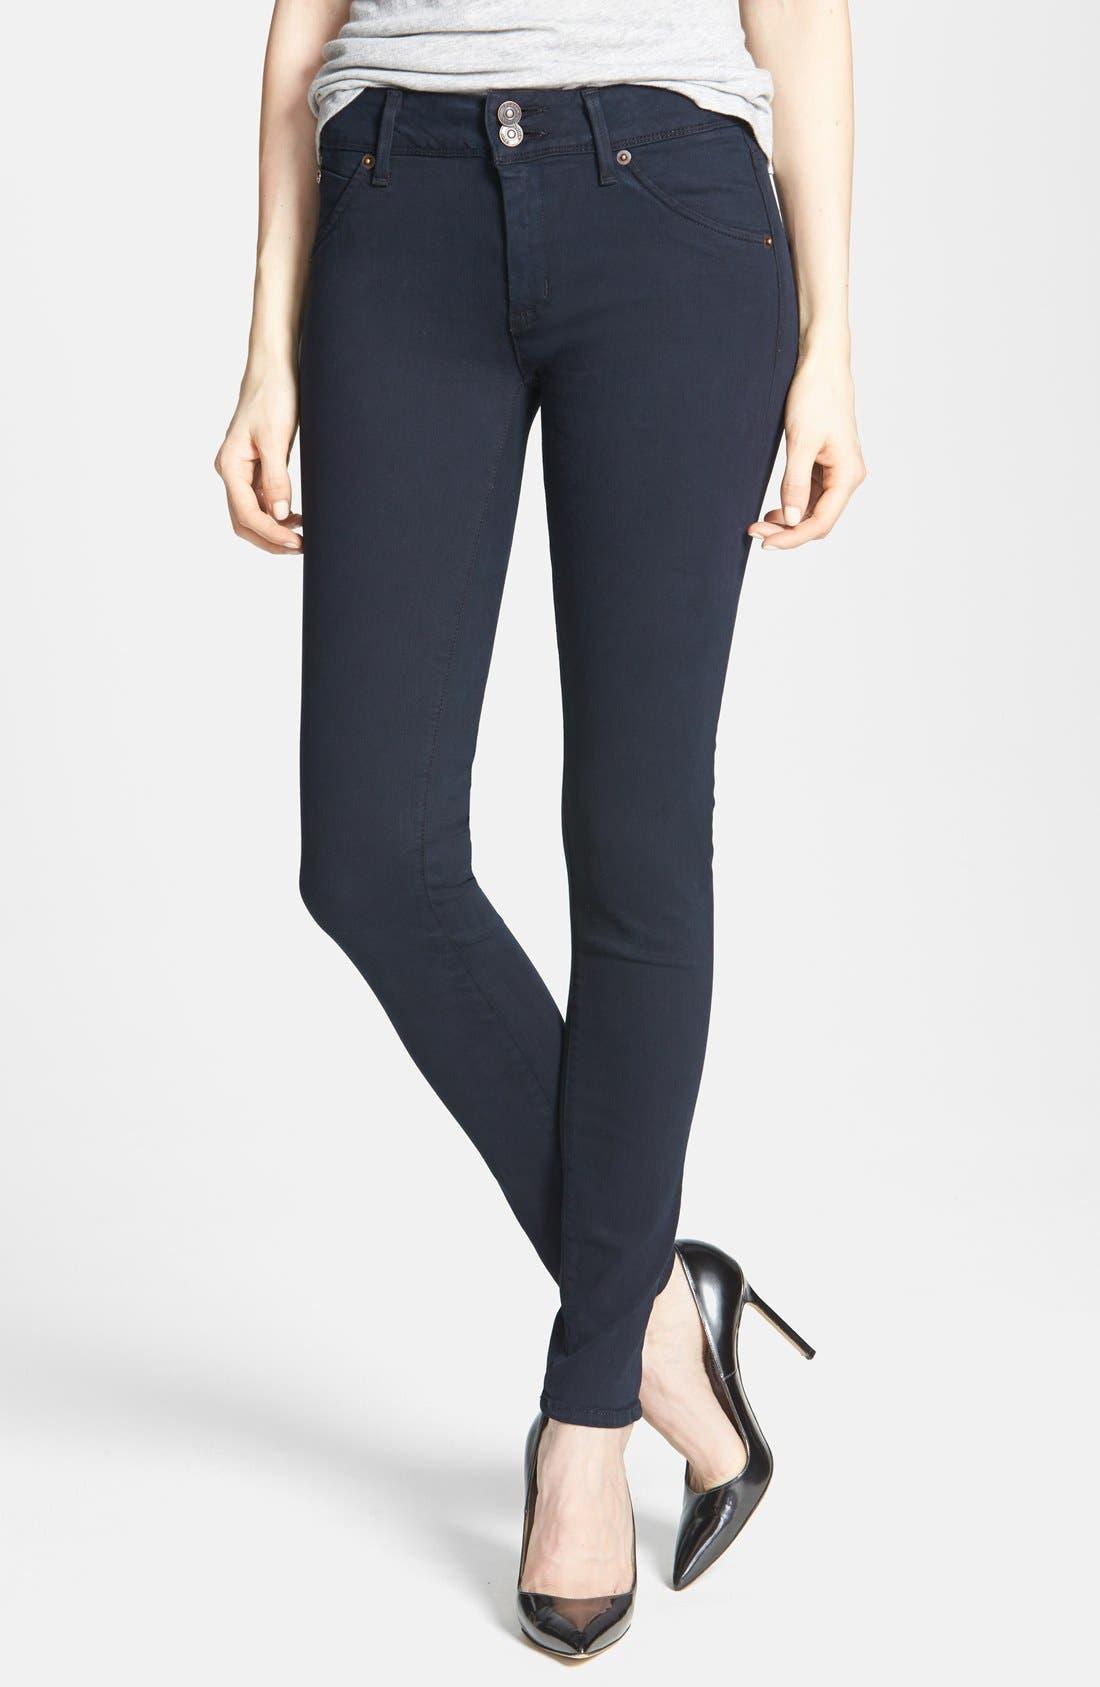 Main Image - Hudson Jeans 'Collin' Skinny Stretch Jeans (Black Iris)